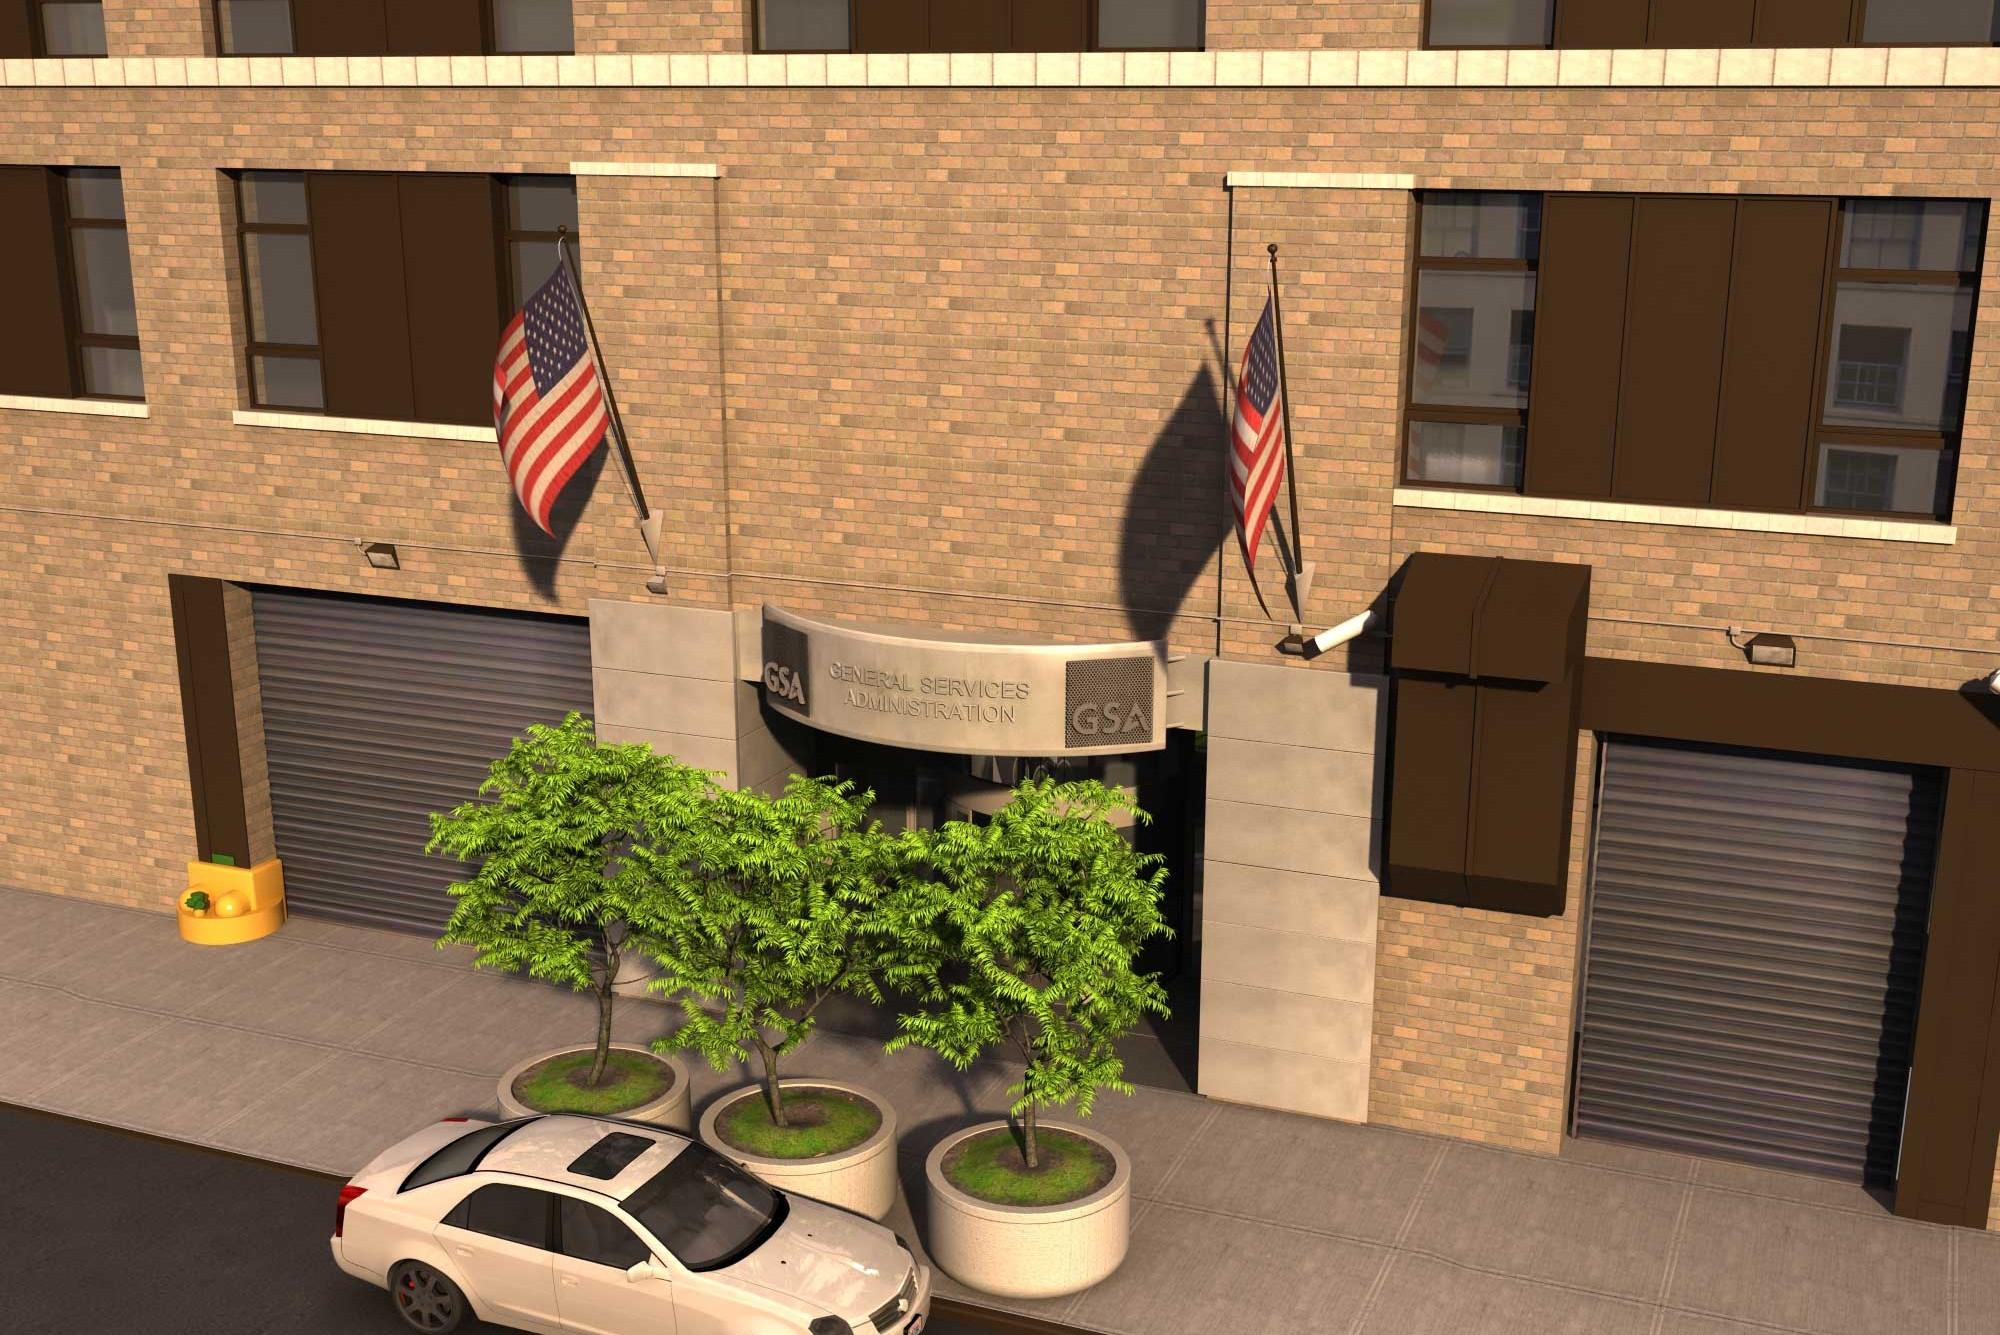 Architectural Rendering Exterior GSA